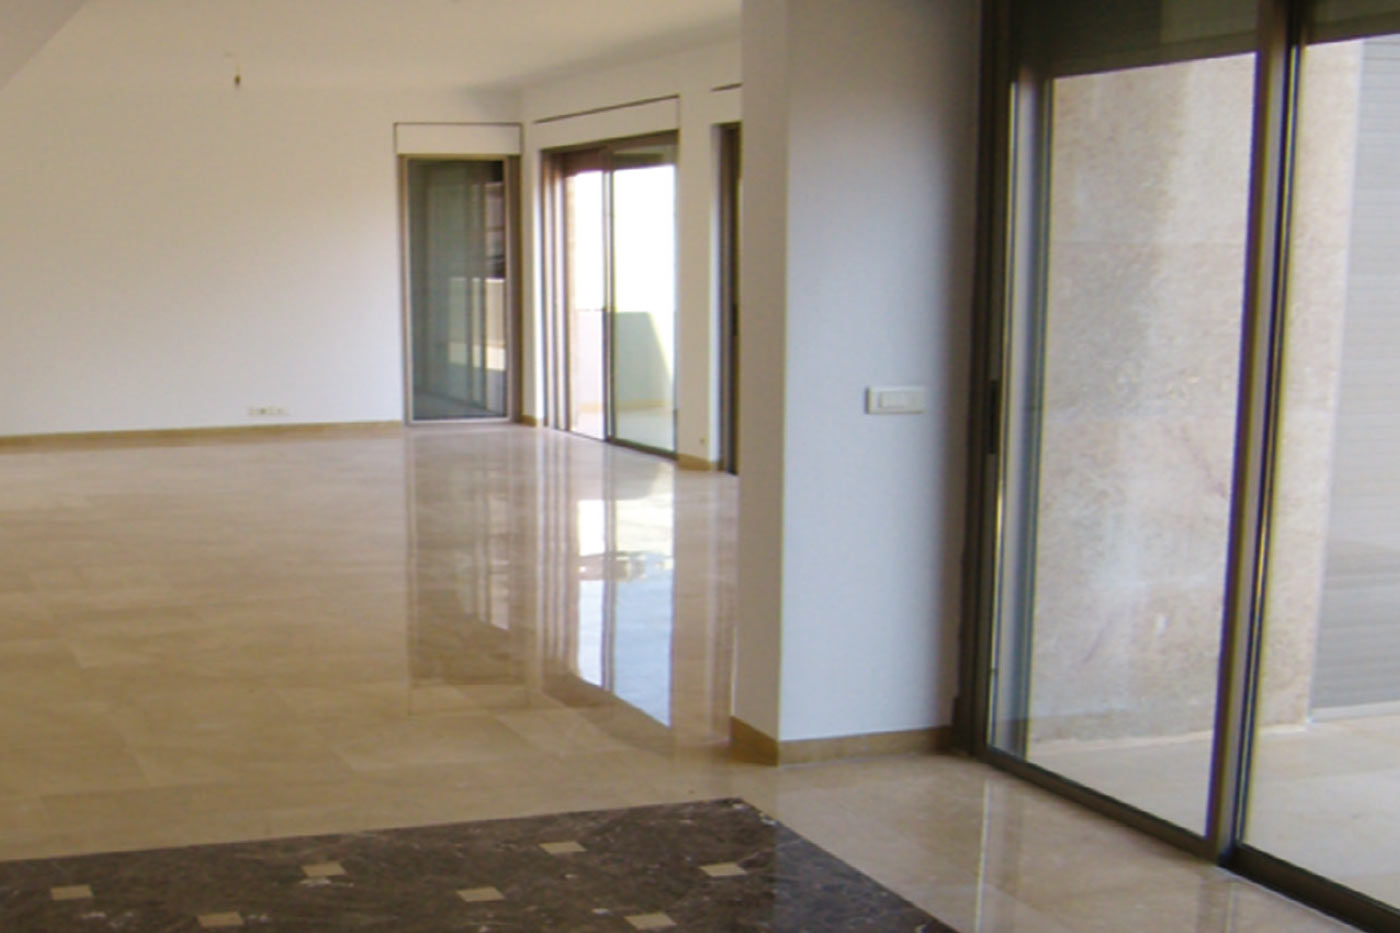 Trabaud Residence - Ground Floor with Glass Sliding Doors